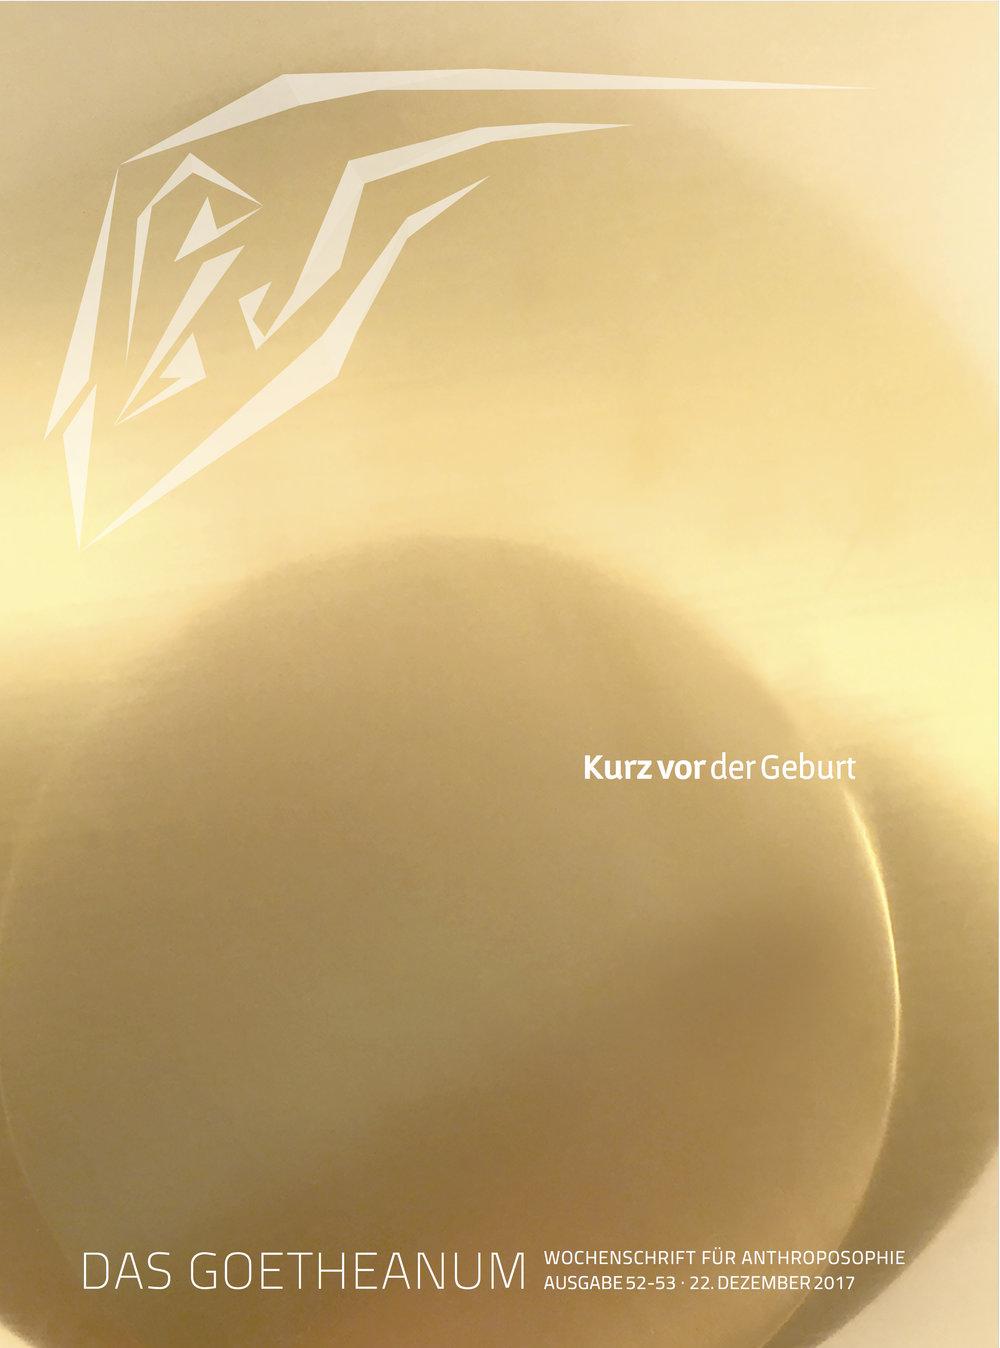 G2017_52-53_Geburt_Cover Kopie.jpg